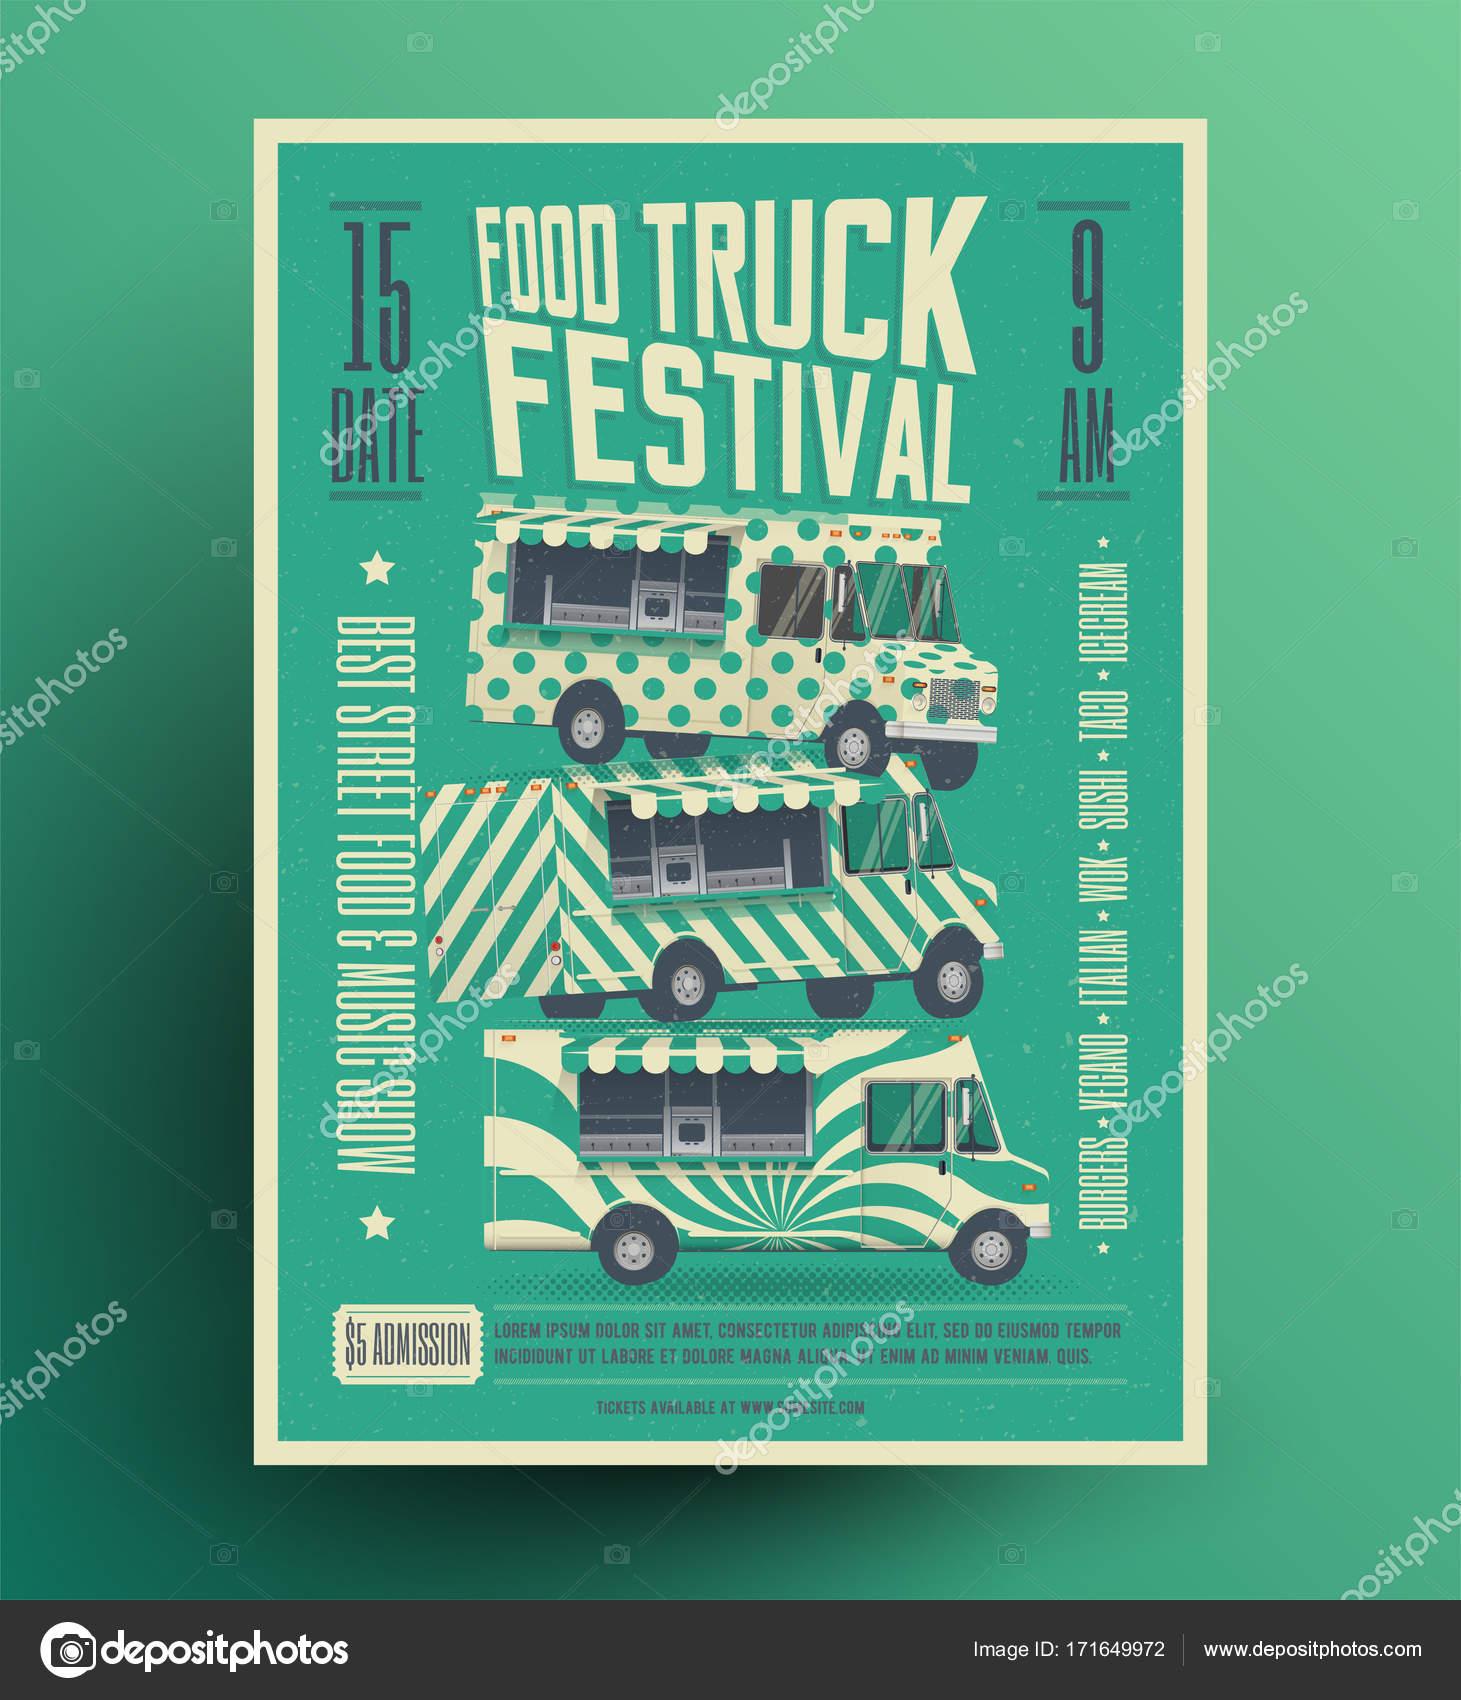 Street Food Truck Festival Poster Flyer Template Vector - Food truck flyer template